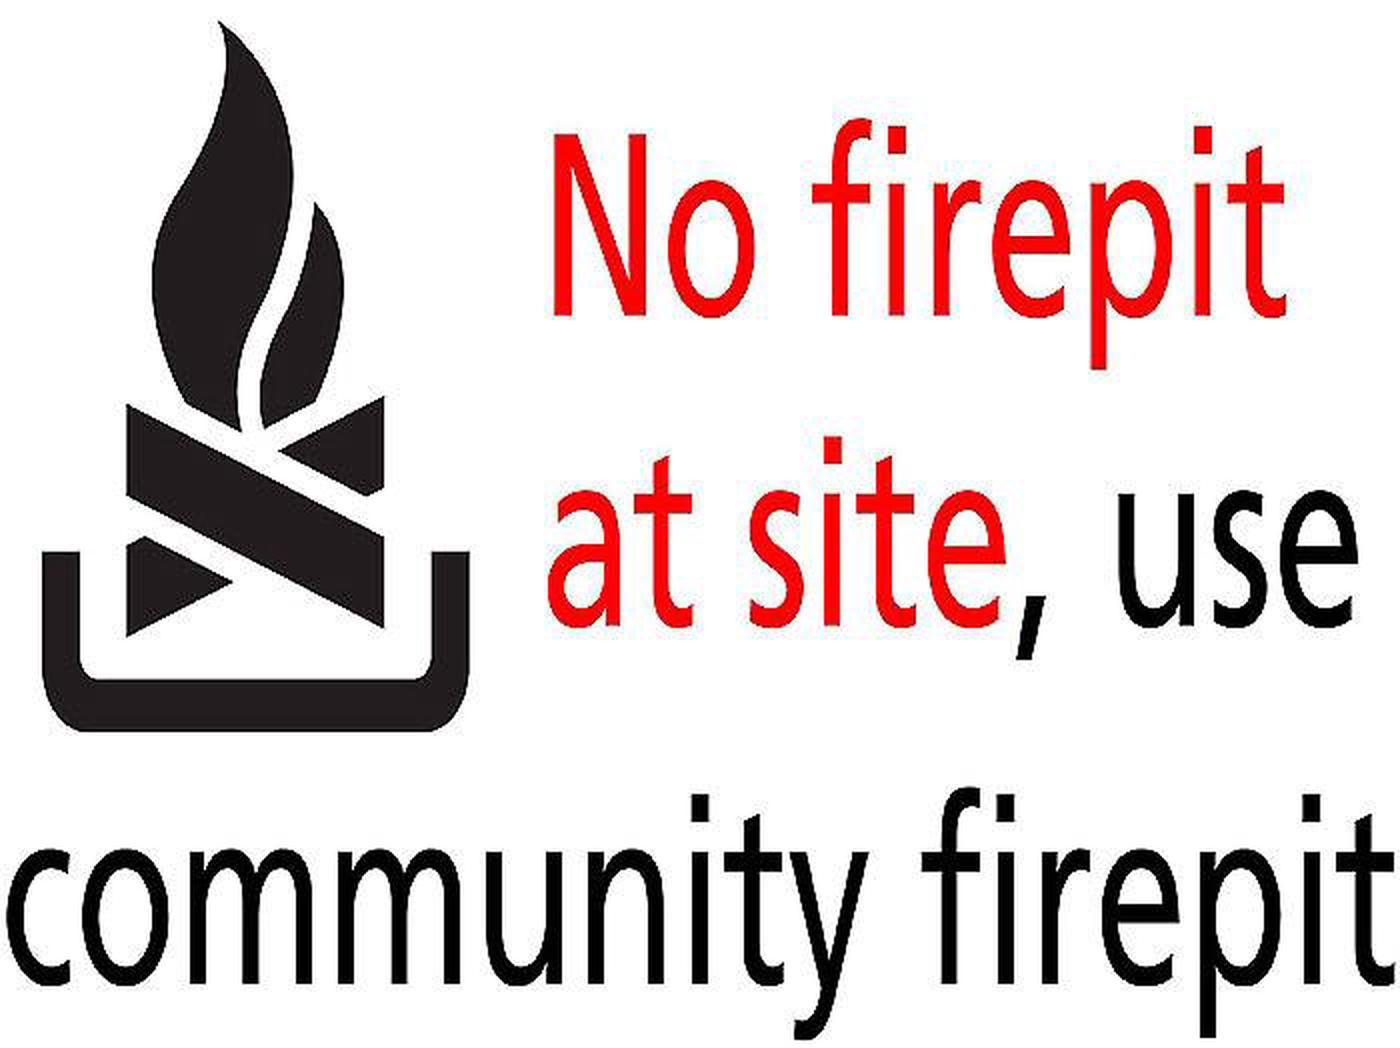 No firepit